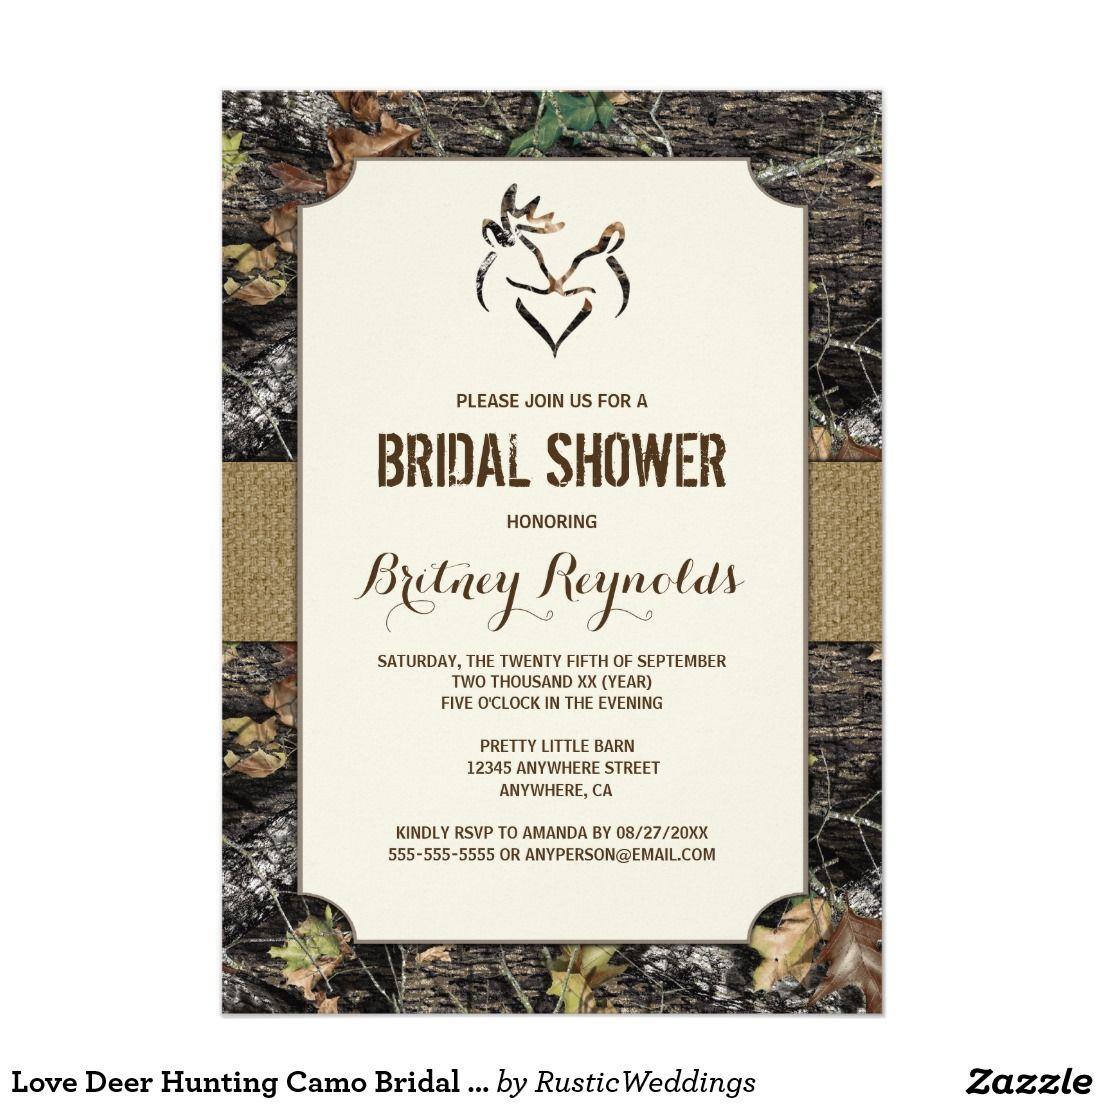 Sams Club Wedding Invitations: Love Deer Hunting Camo Bridal Shower Invitations